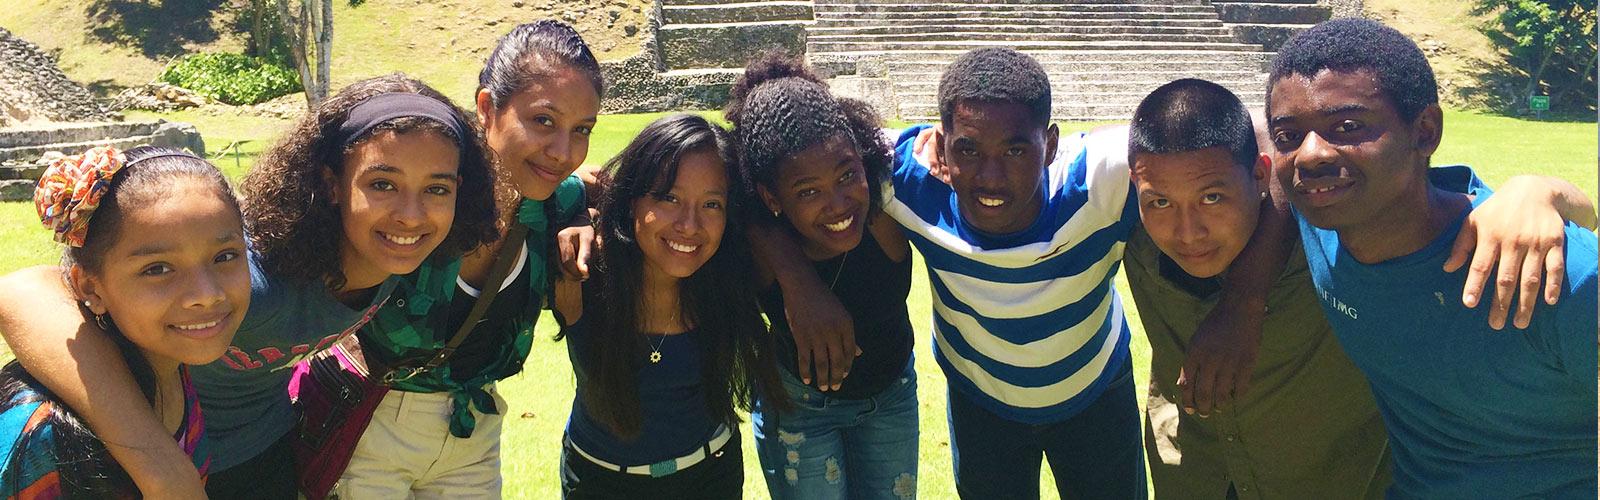 Belize Baha'i Youth